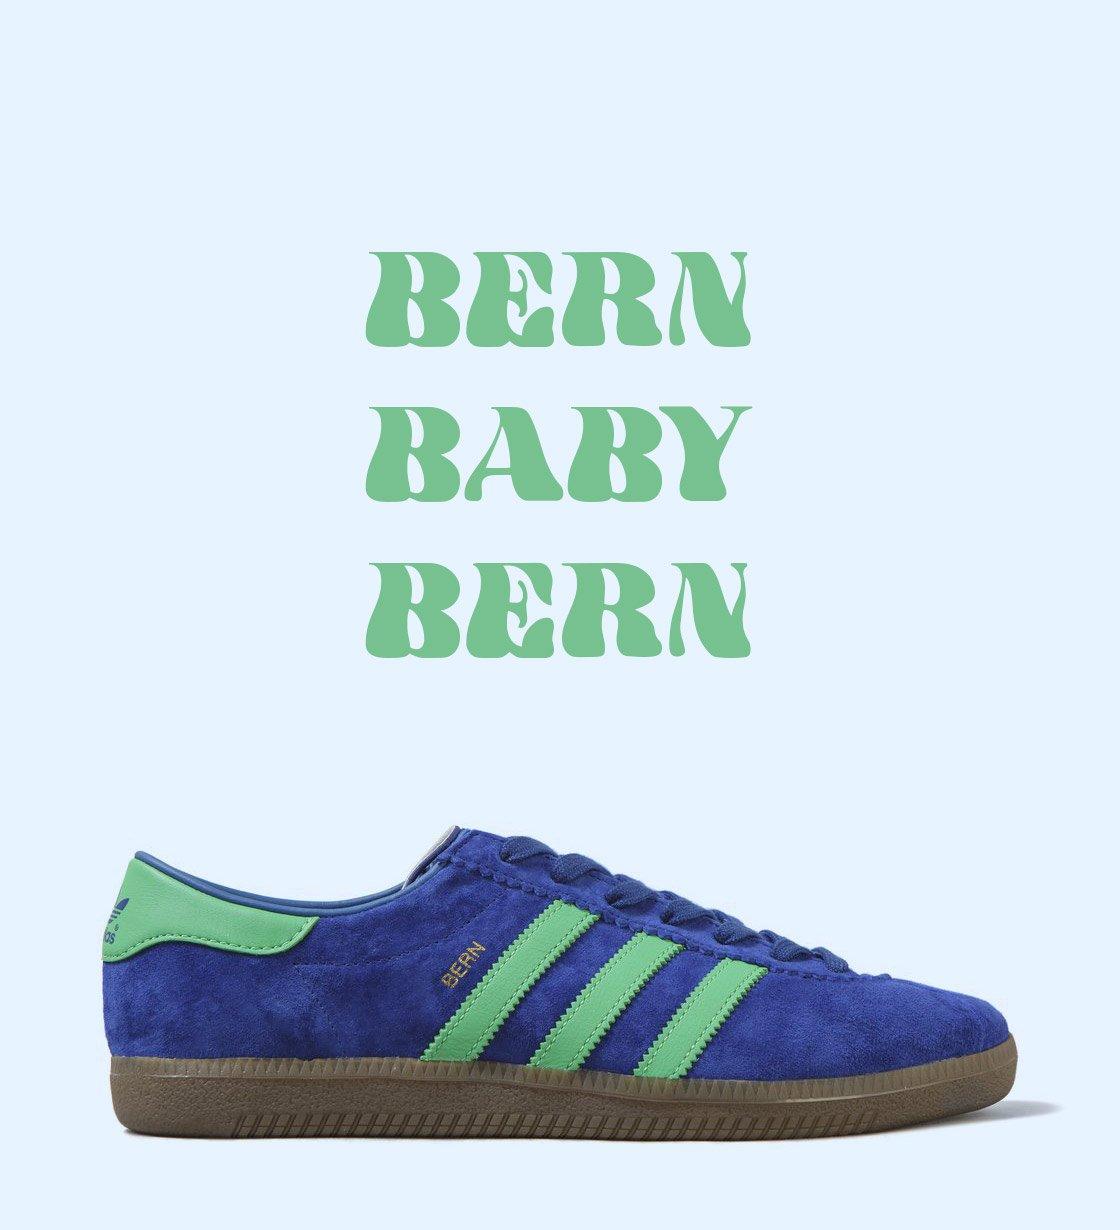 The adidas Bern